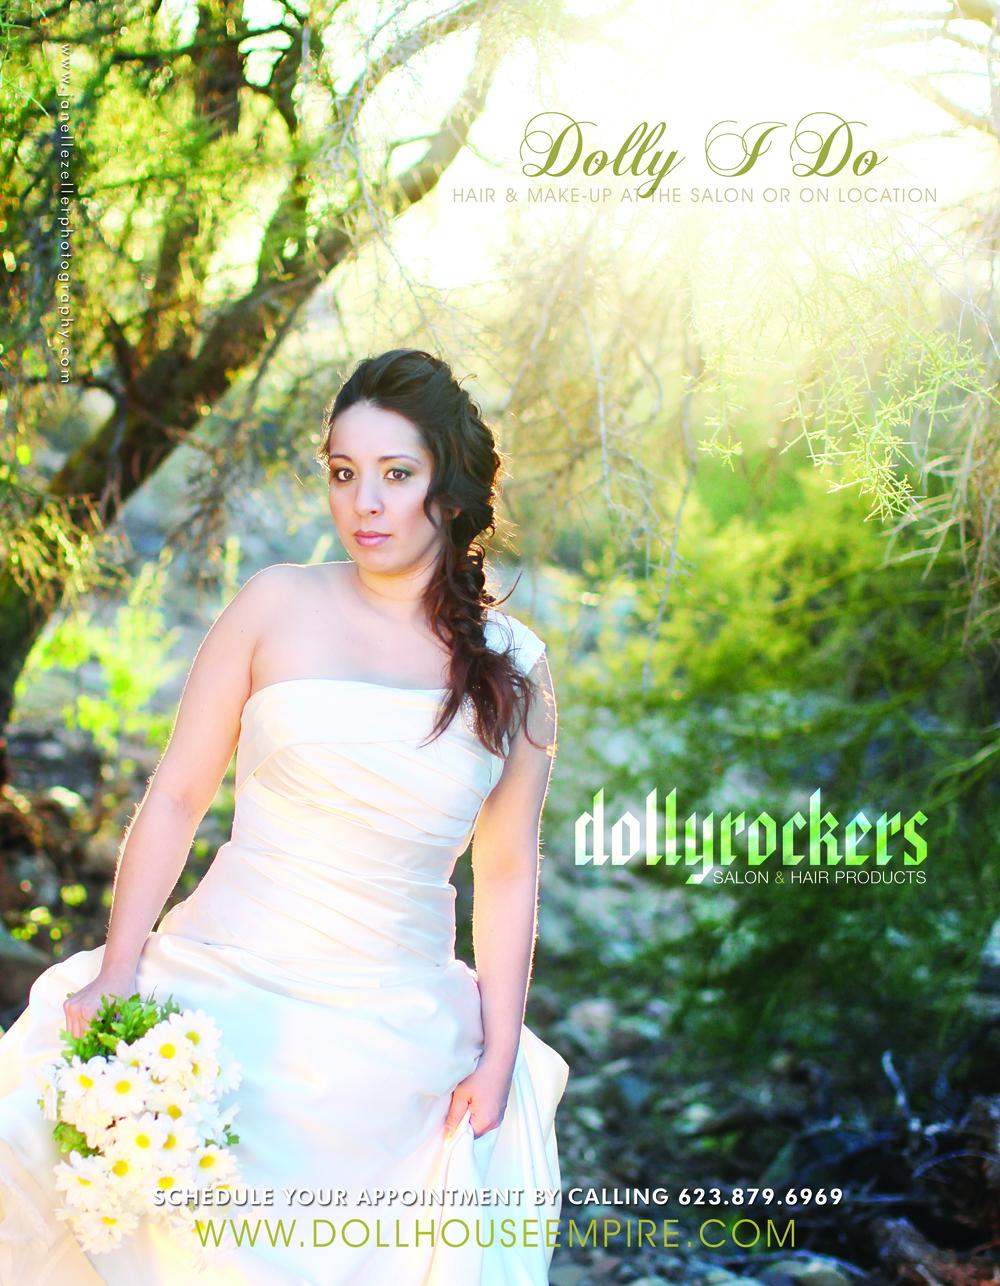 0312_DollyRockers_Full.jpg